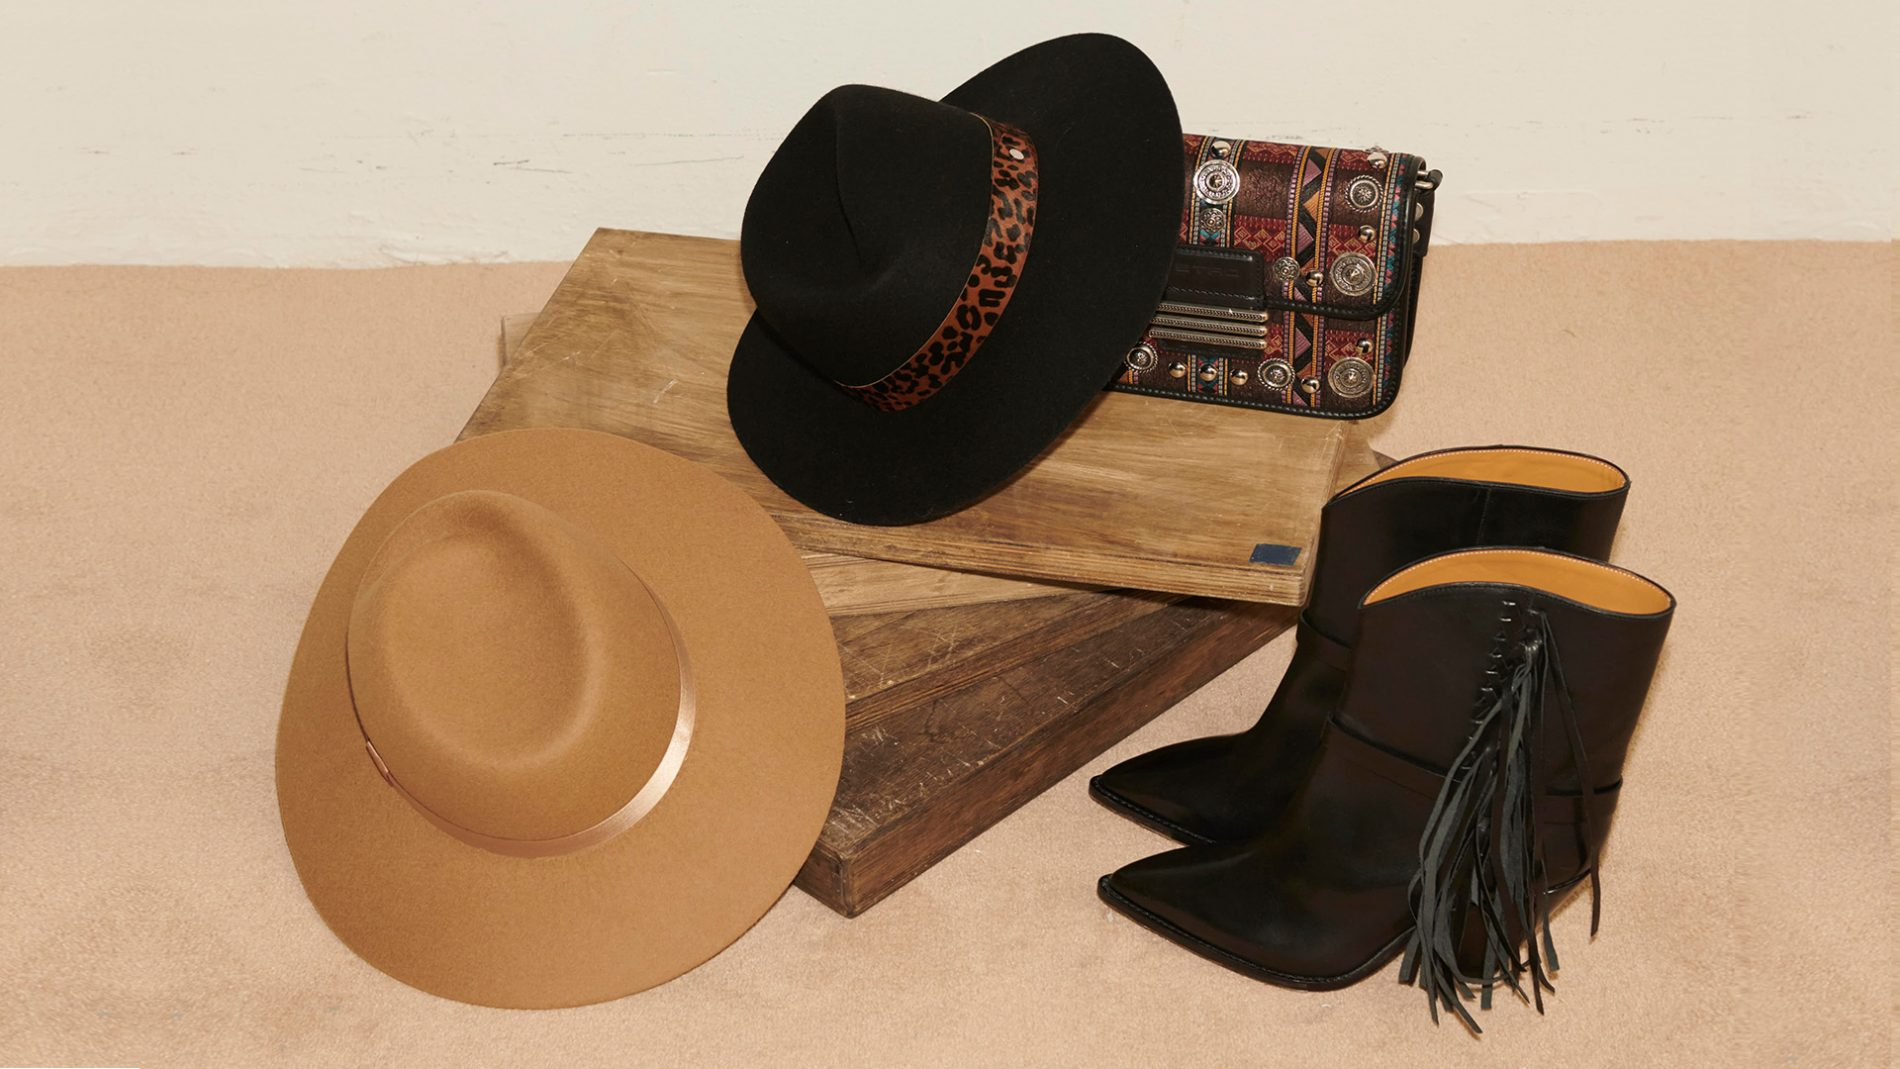 El Corte Inglés Designer Accessories Shoes Handbags Hats Isabel Marant Etro Rag & Bone